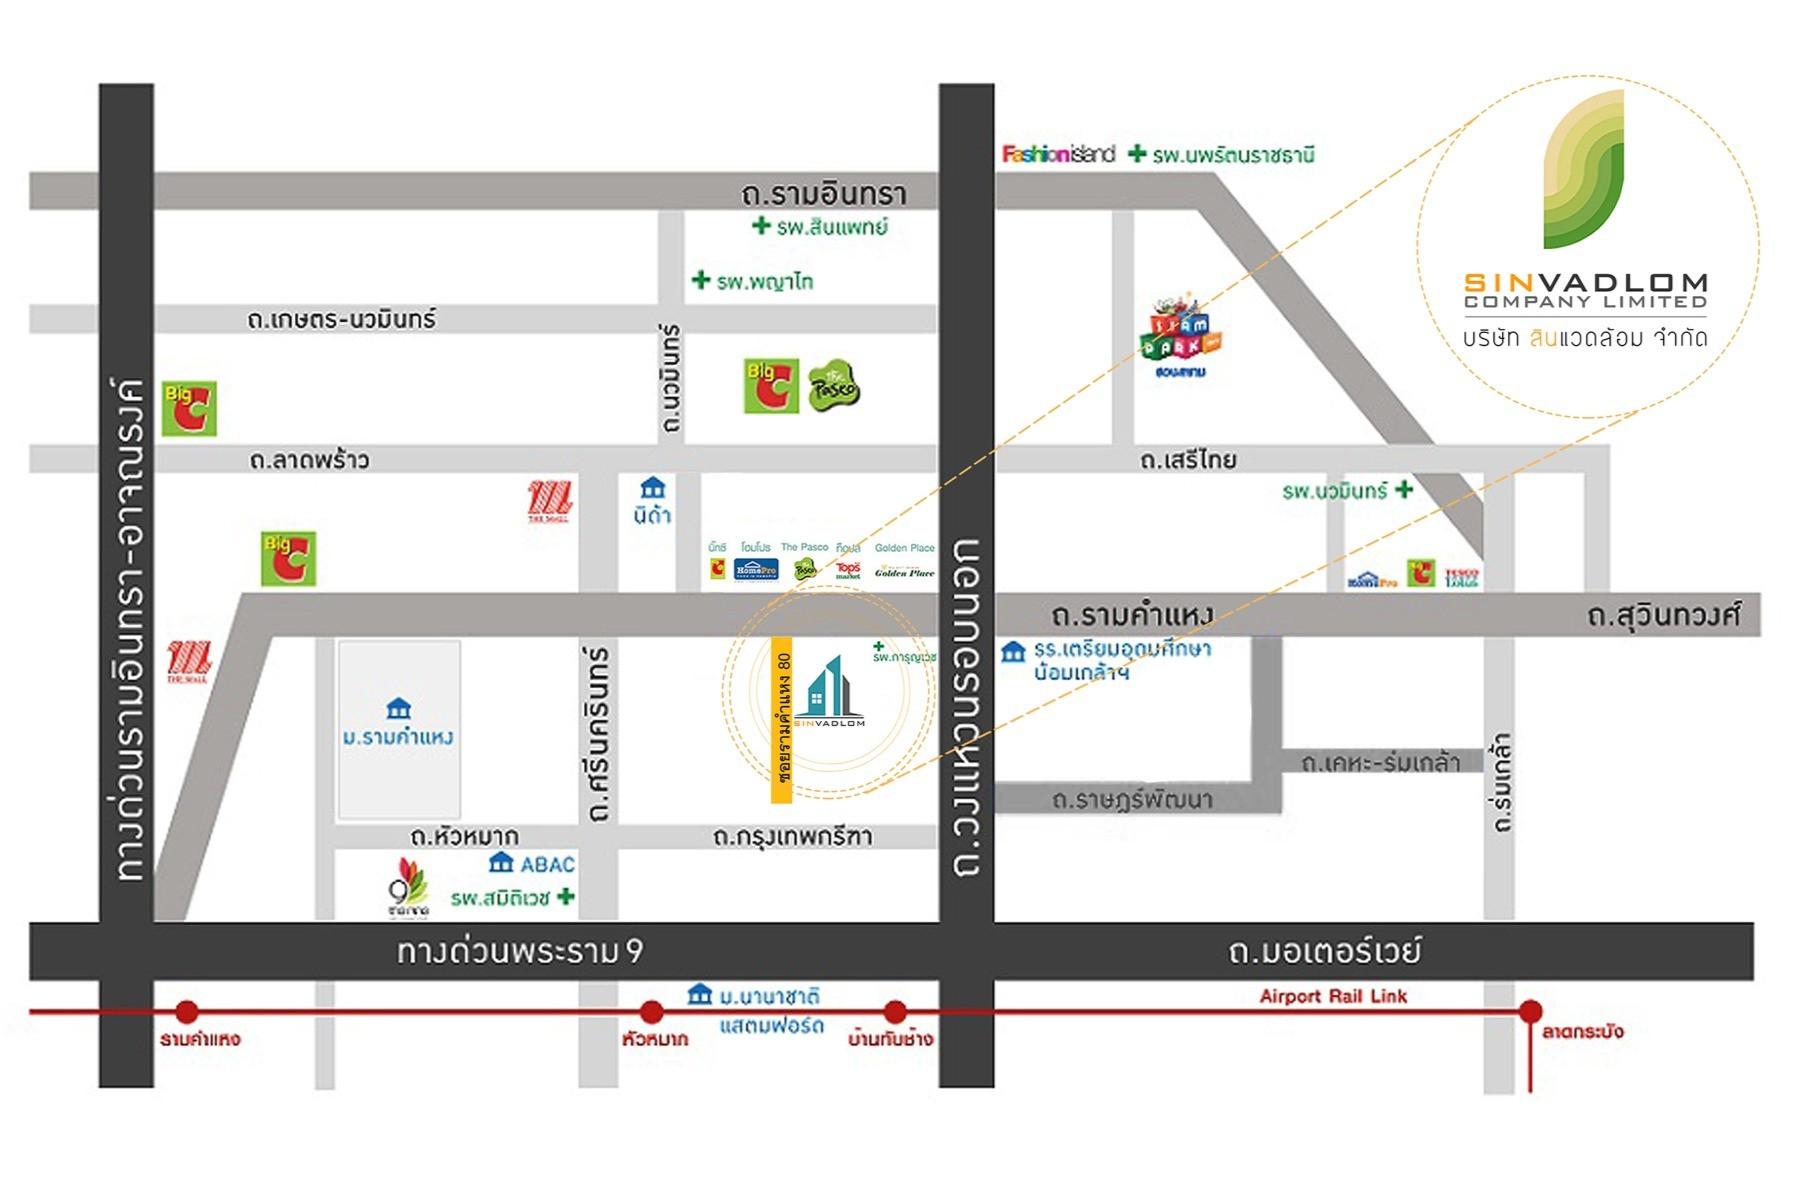 Sinvadlom_Map%252BOH_Web03_edited_edited